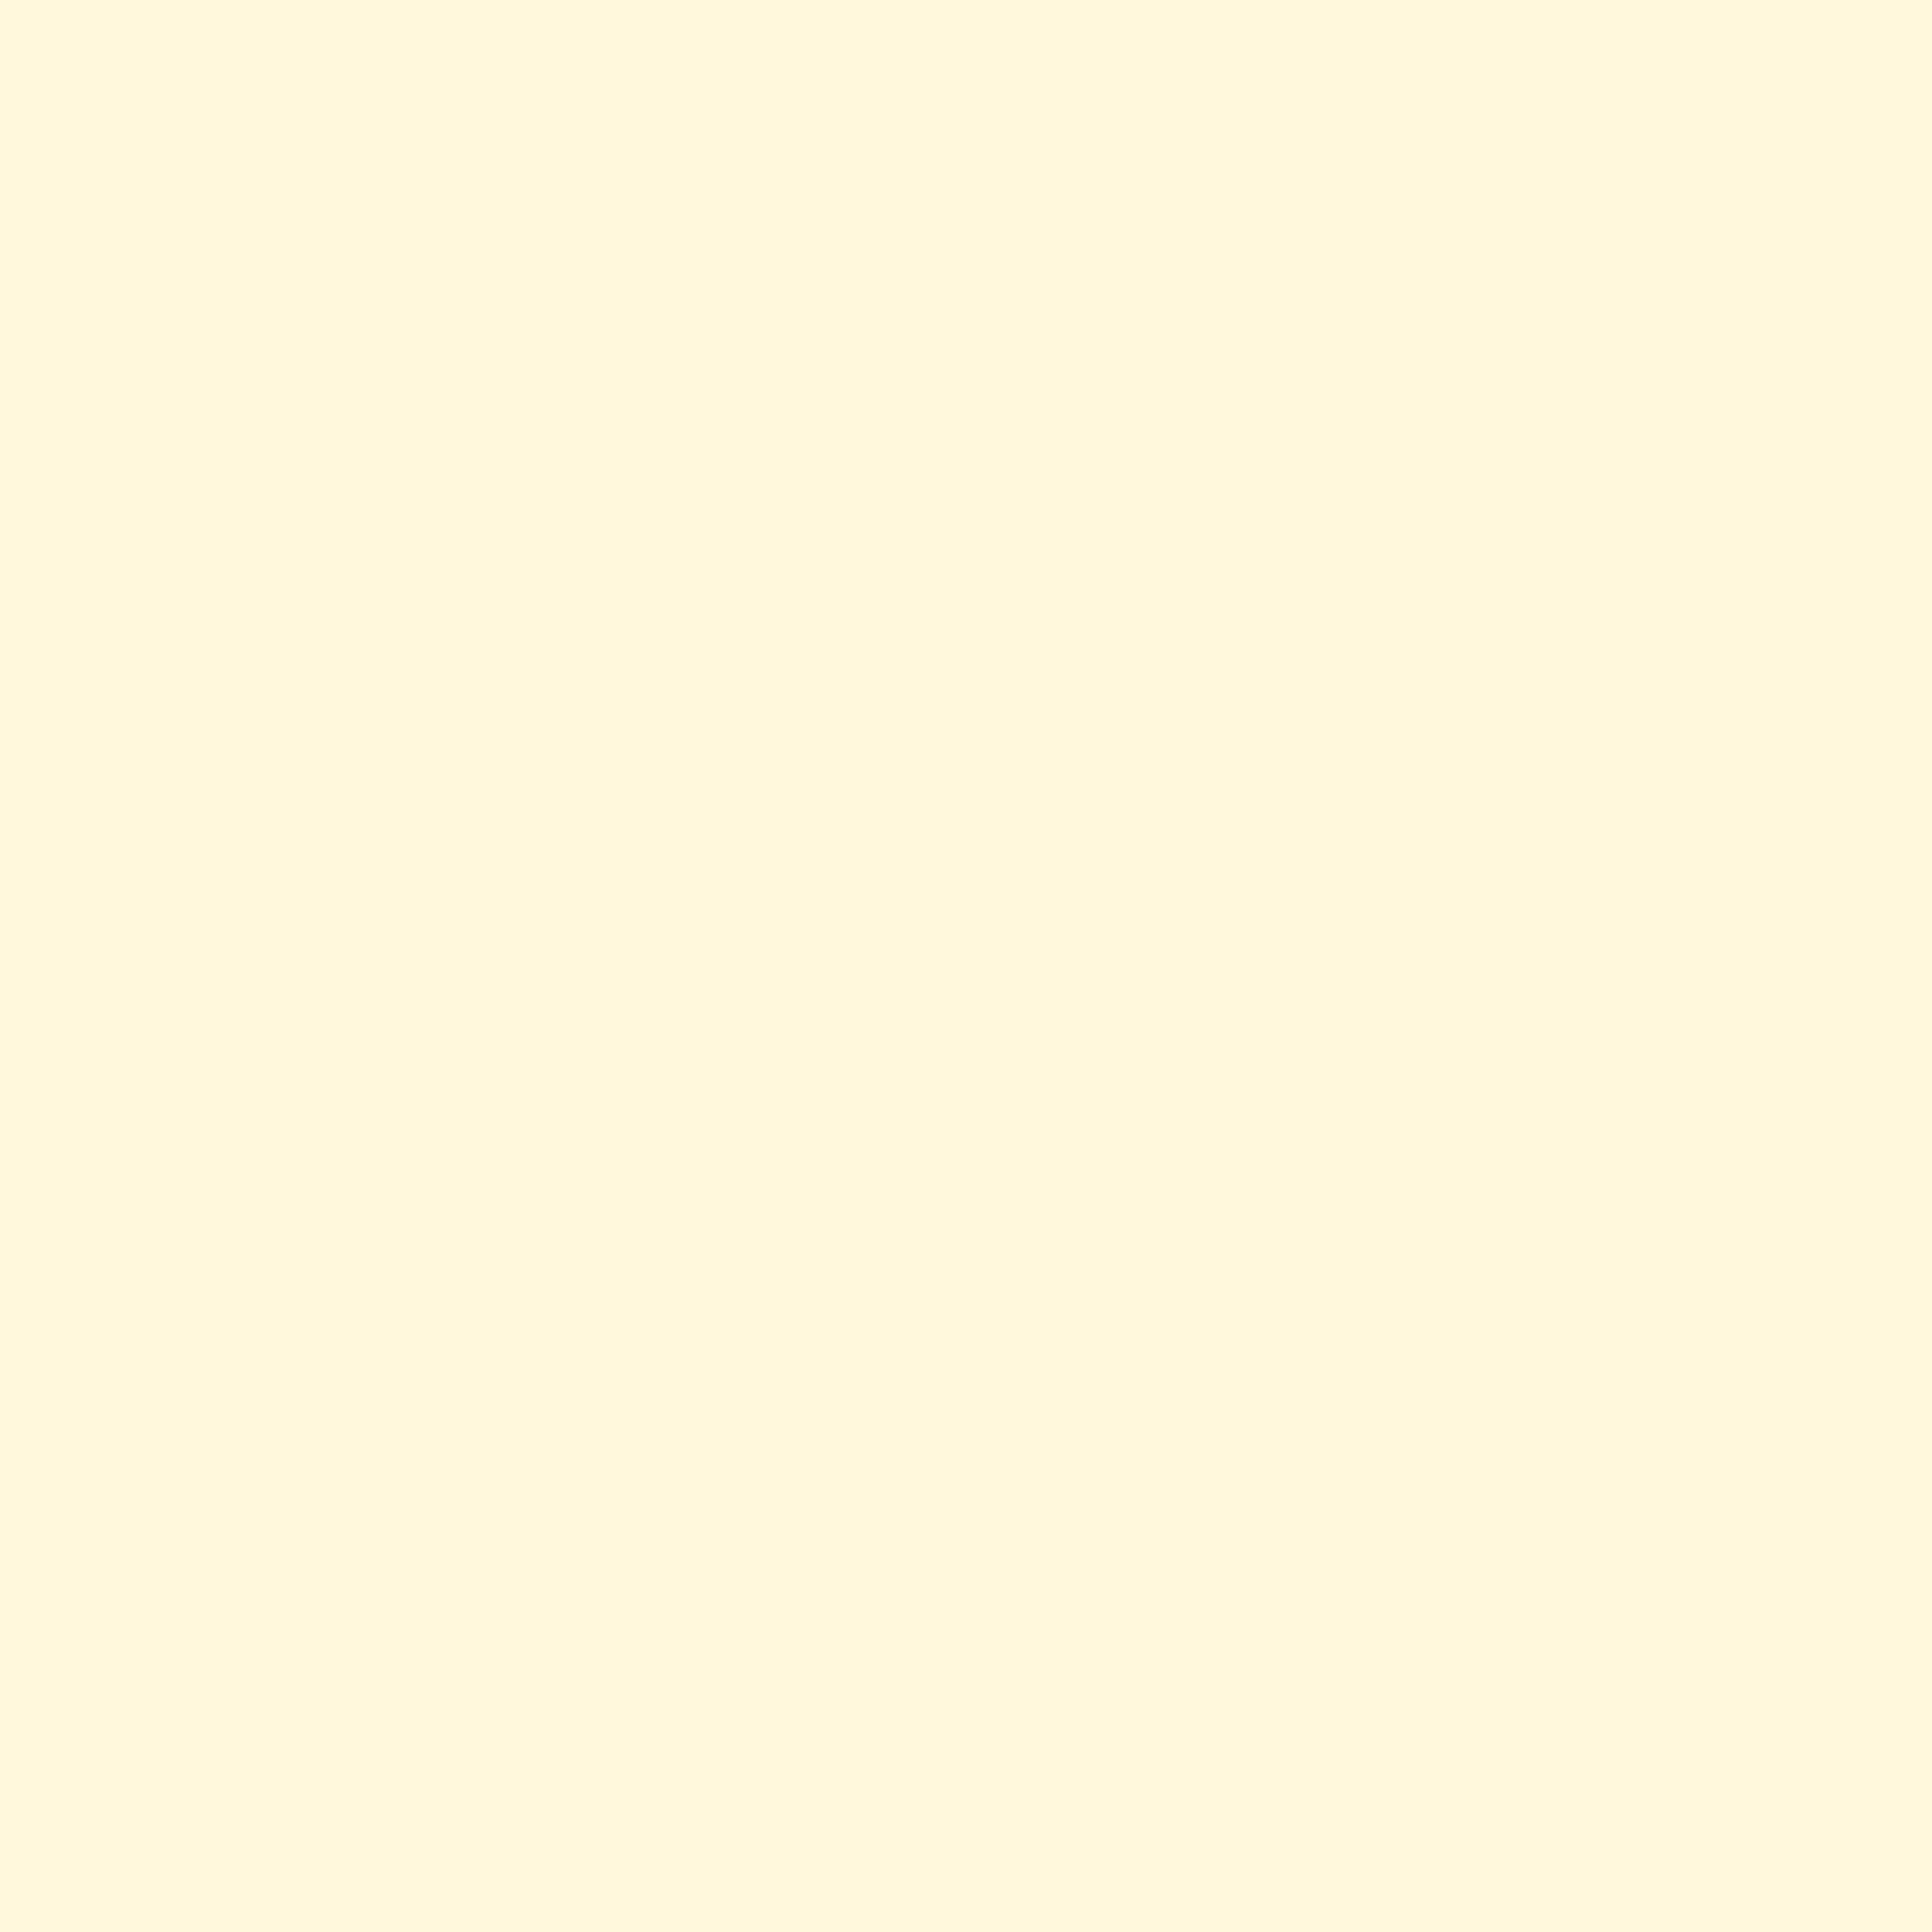 2048x2048 Cornsilk Solid Color Background